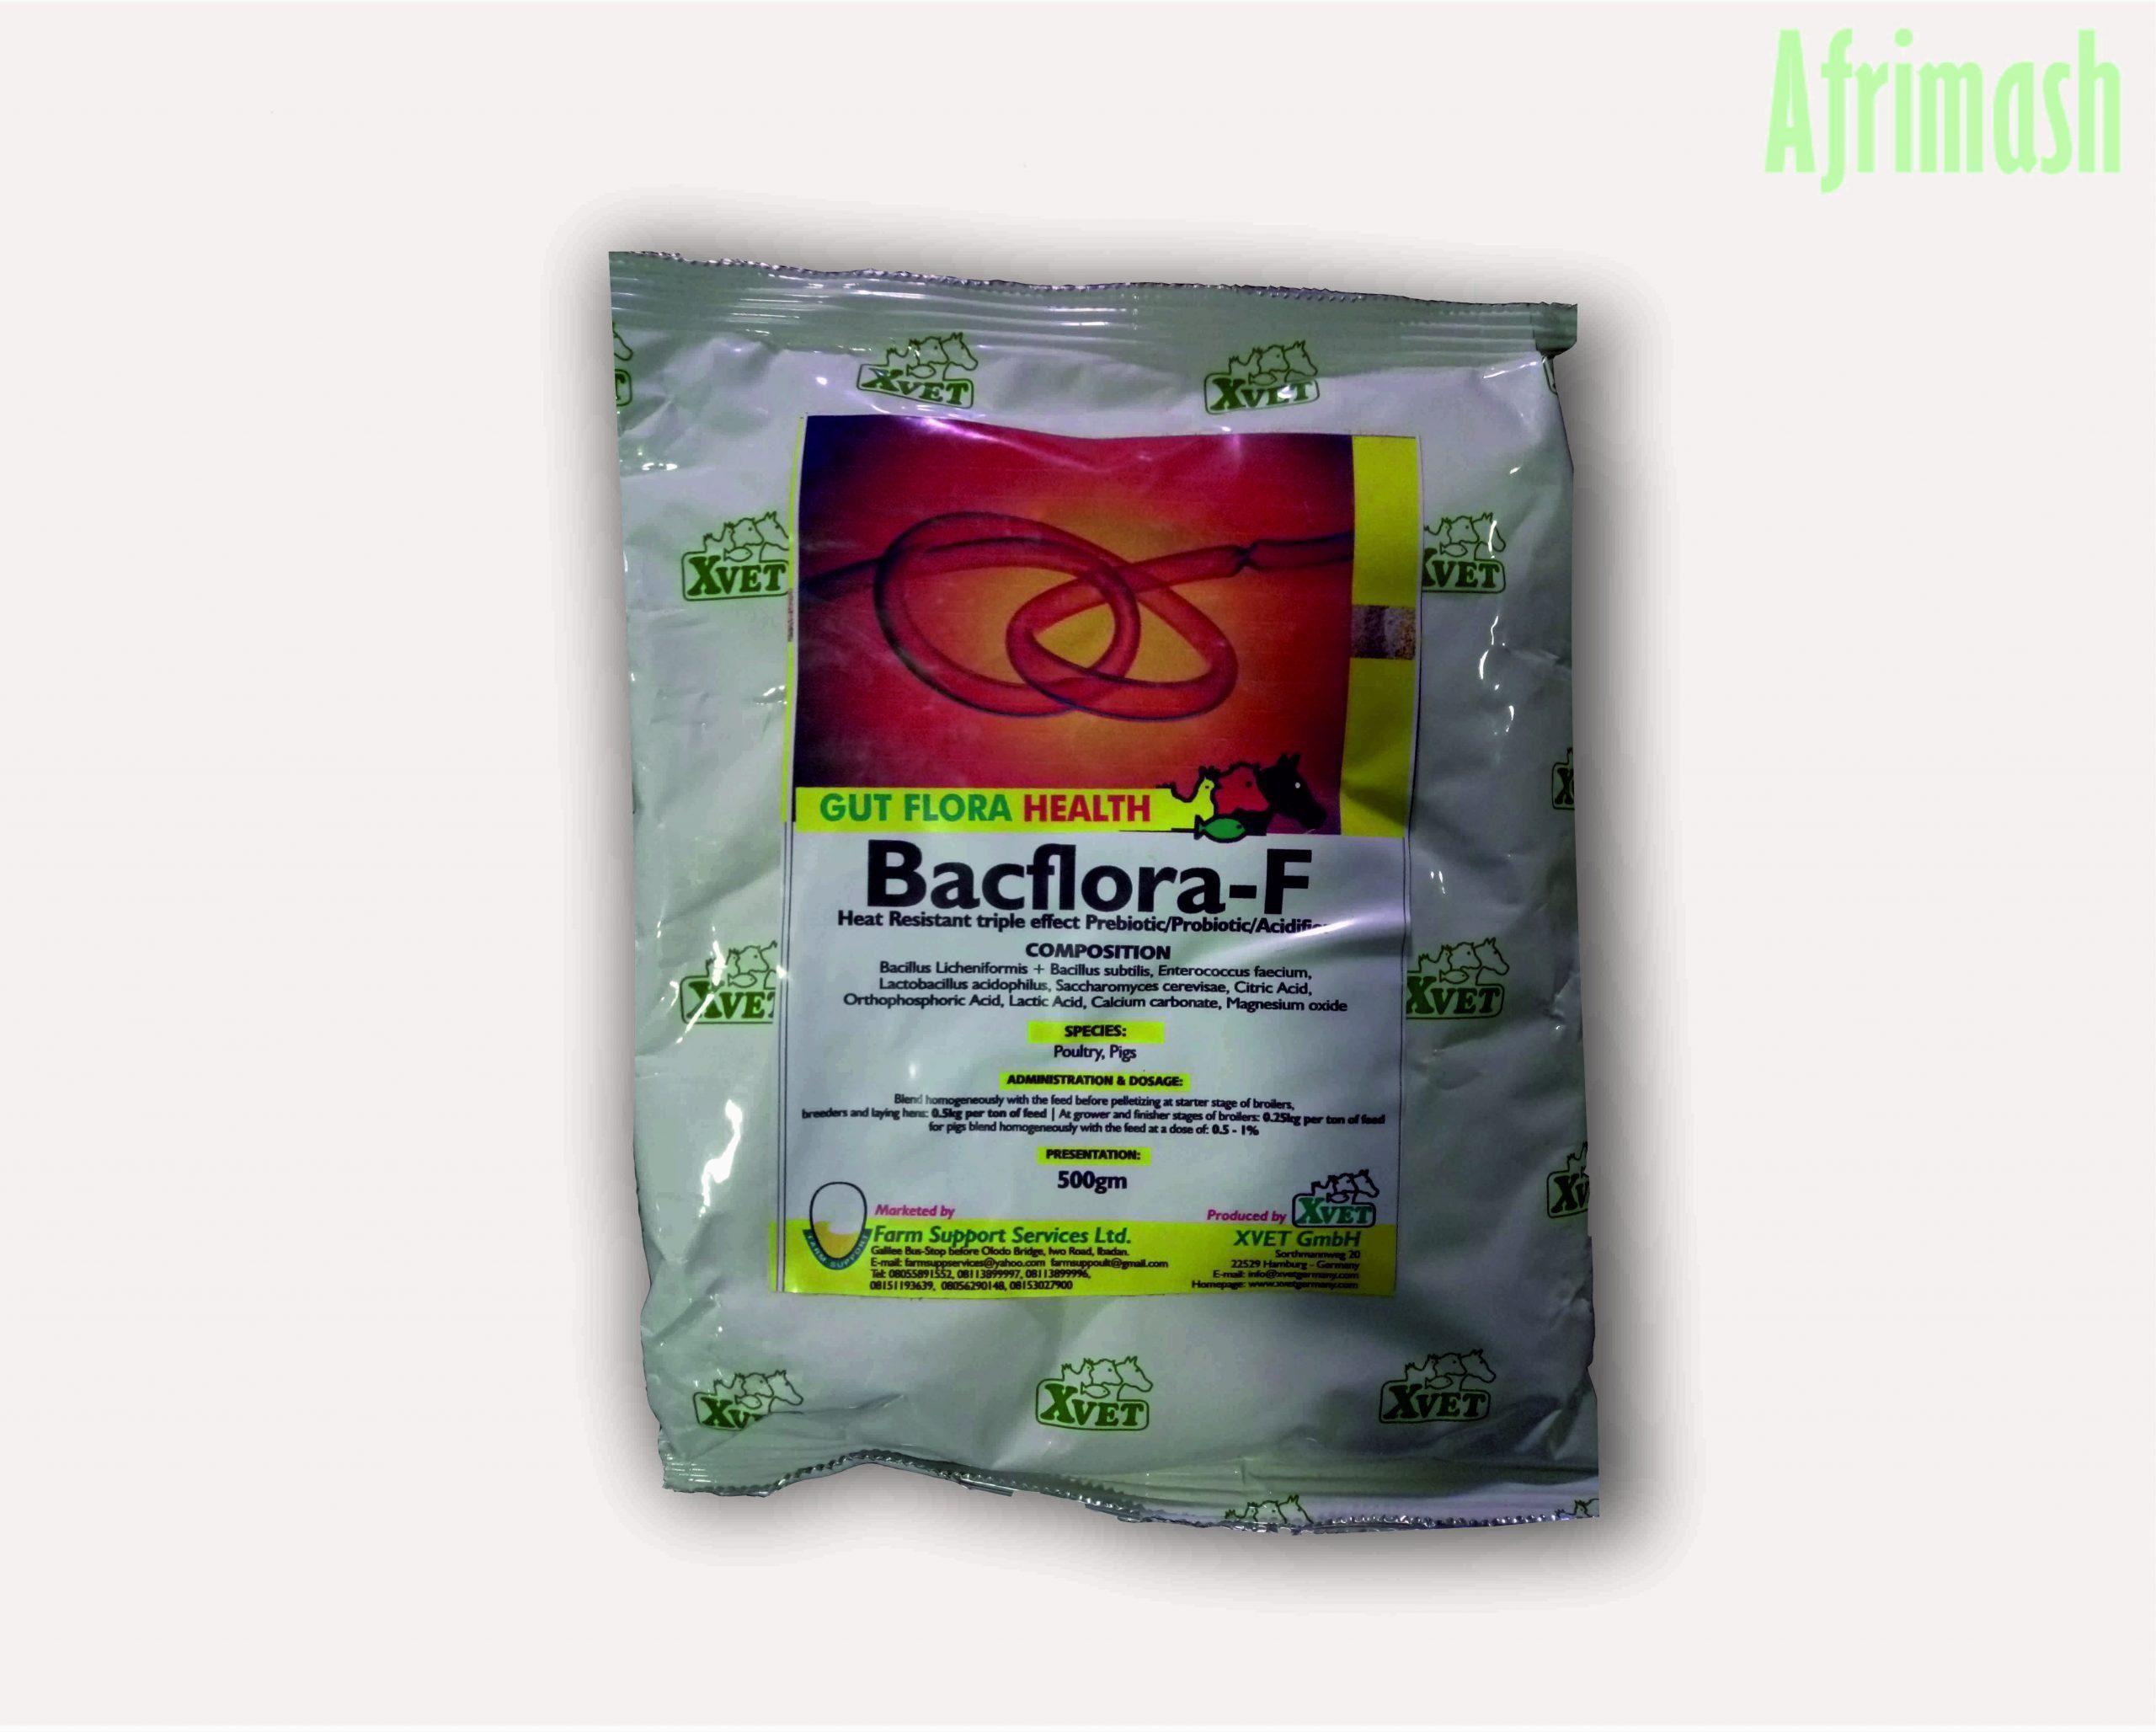 Bacflora-F